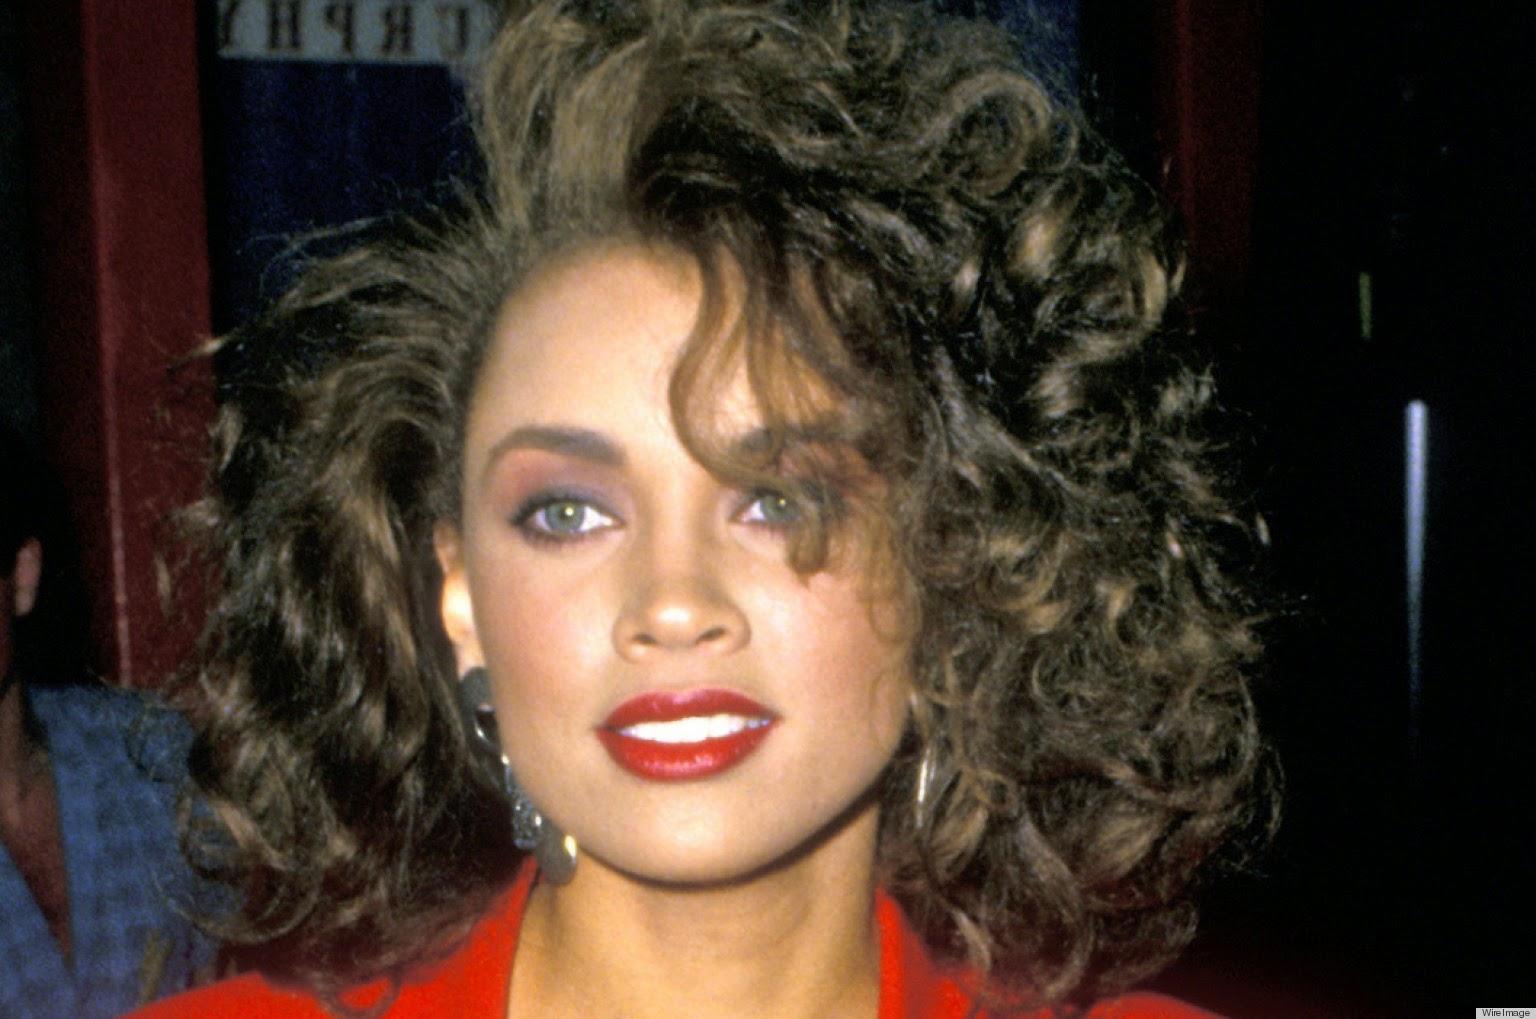 Reaganite Independent: Elegant Black Girls Of The 80s Make